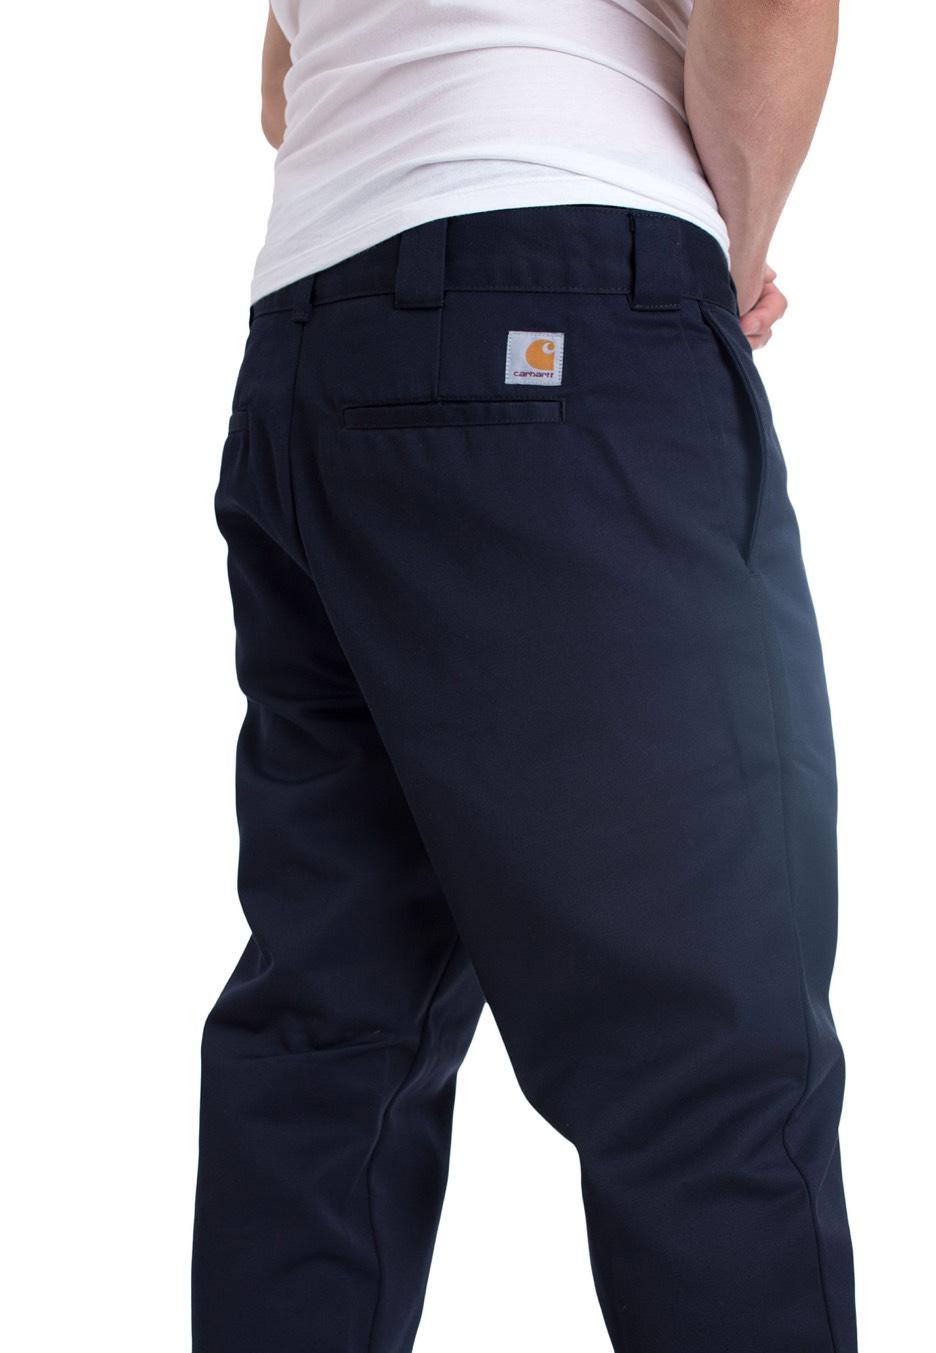 Master Twill Rinsed Carhartt Denison Navy Wip Pantalons Dark vq6n5w